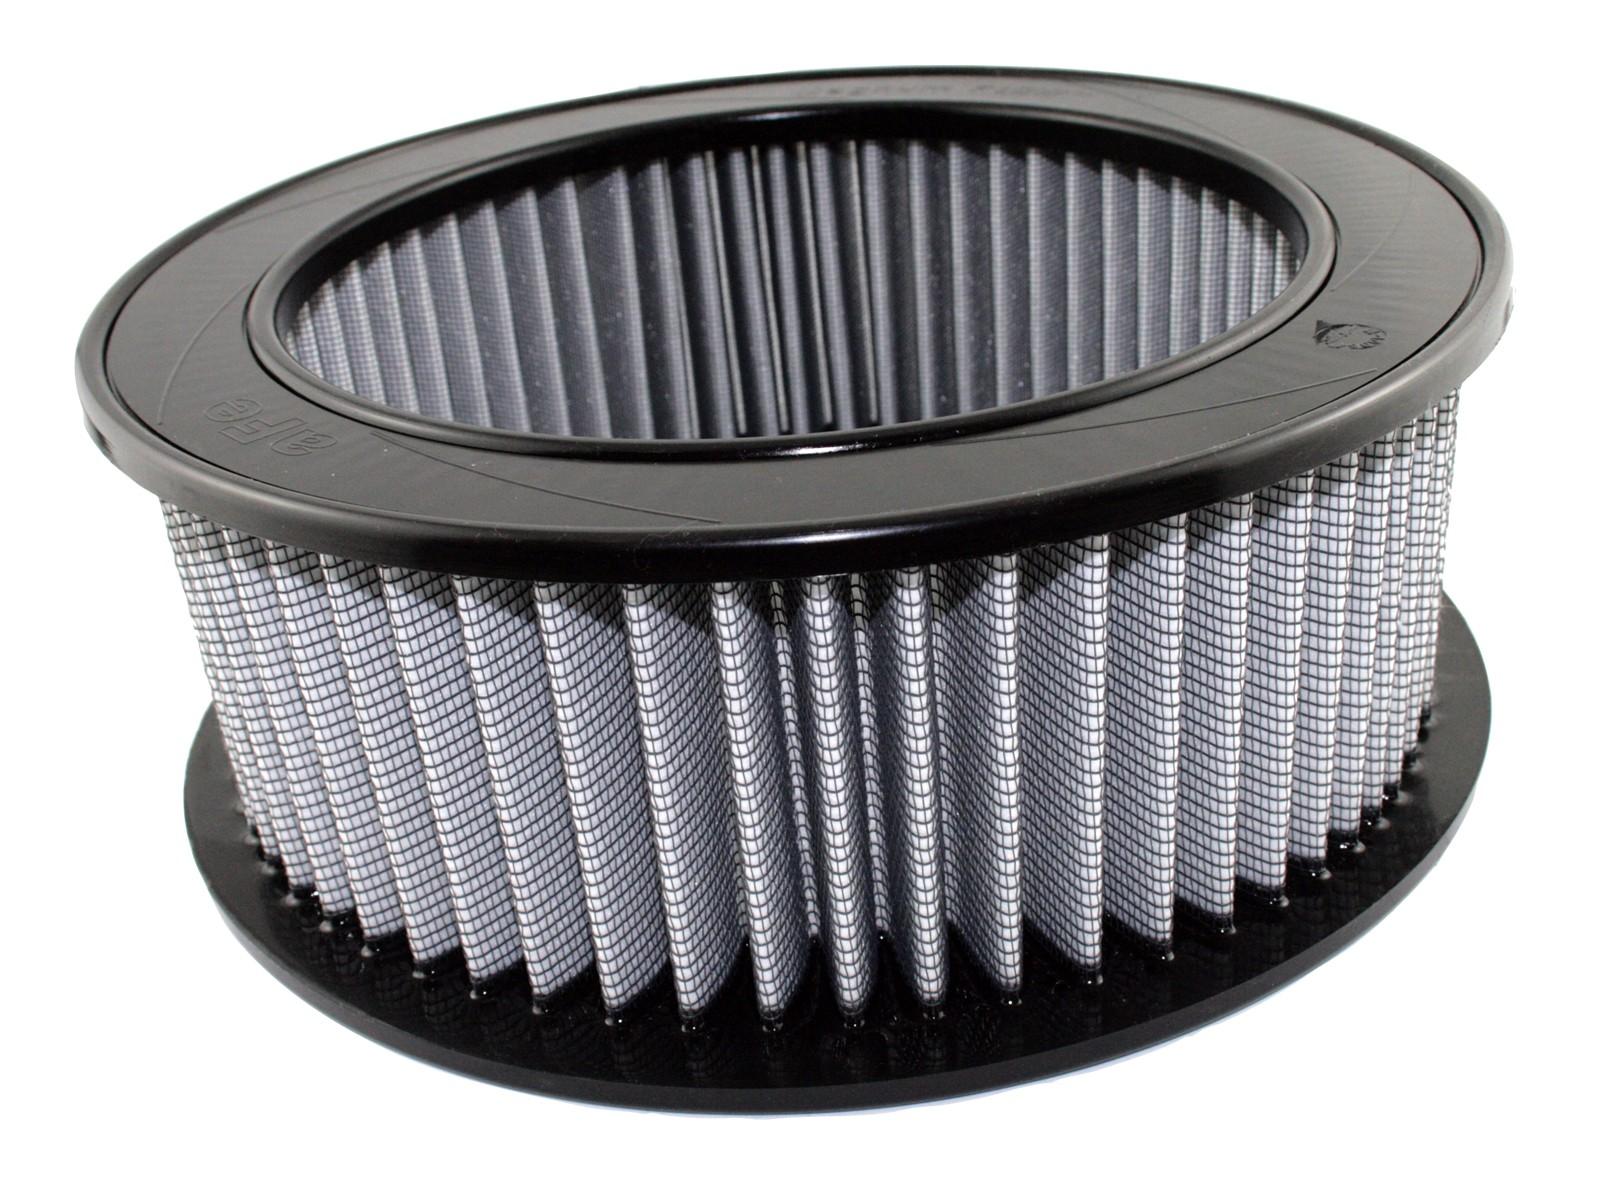 aFe POWER 11-10064 Magnum FLOW Pro DRY S Air Filter